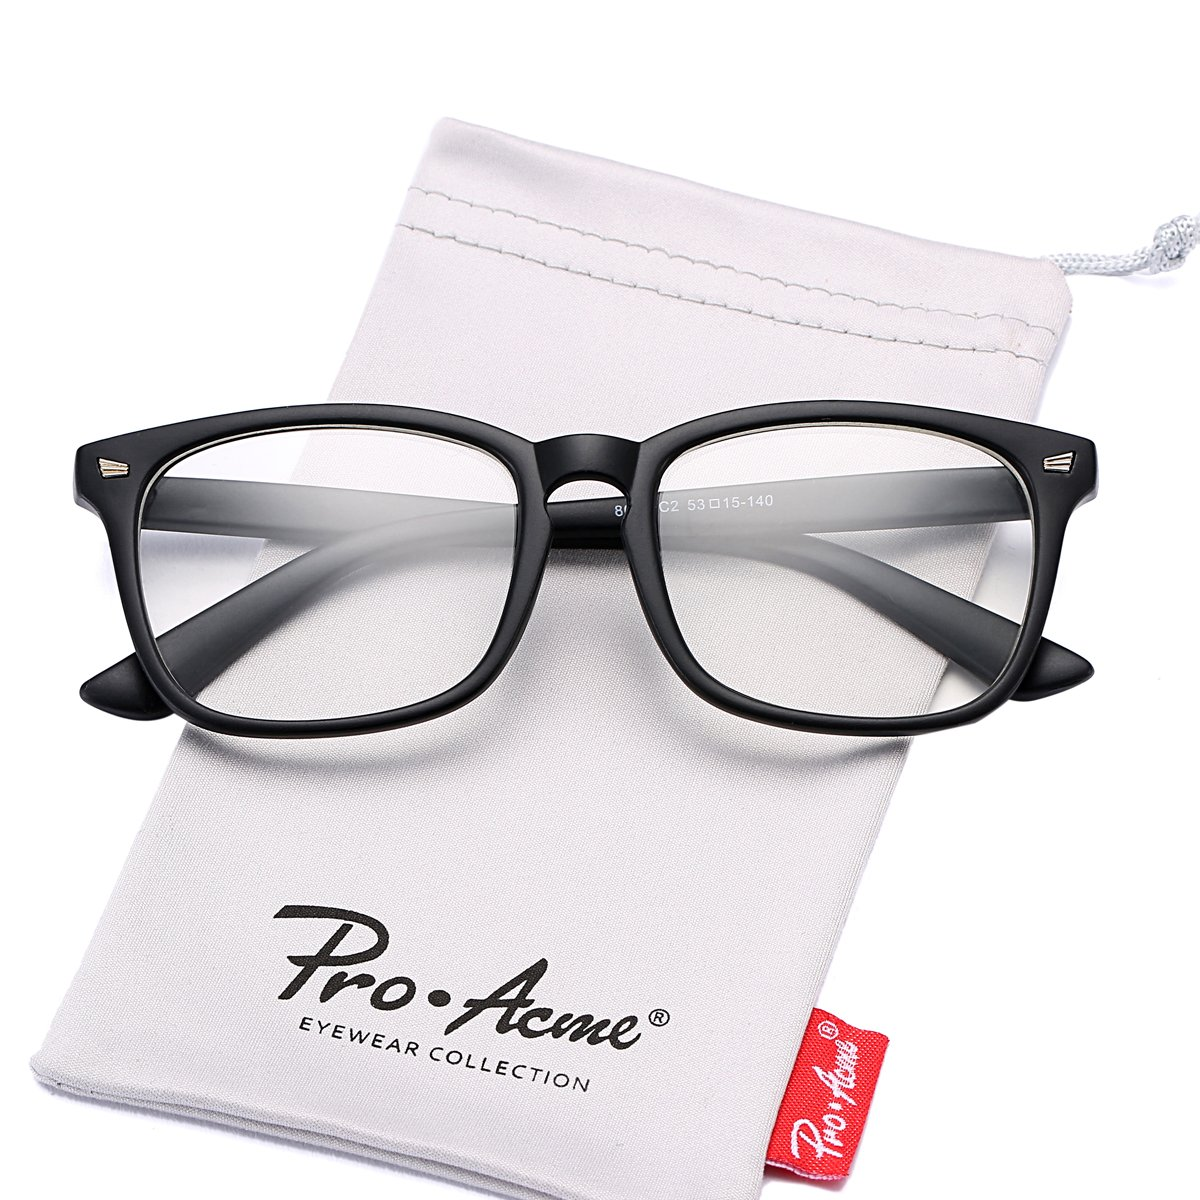 6099021840 Pro Acme Non-prescription Glasses Frame Clear Lens Eyeglasses product image